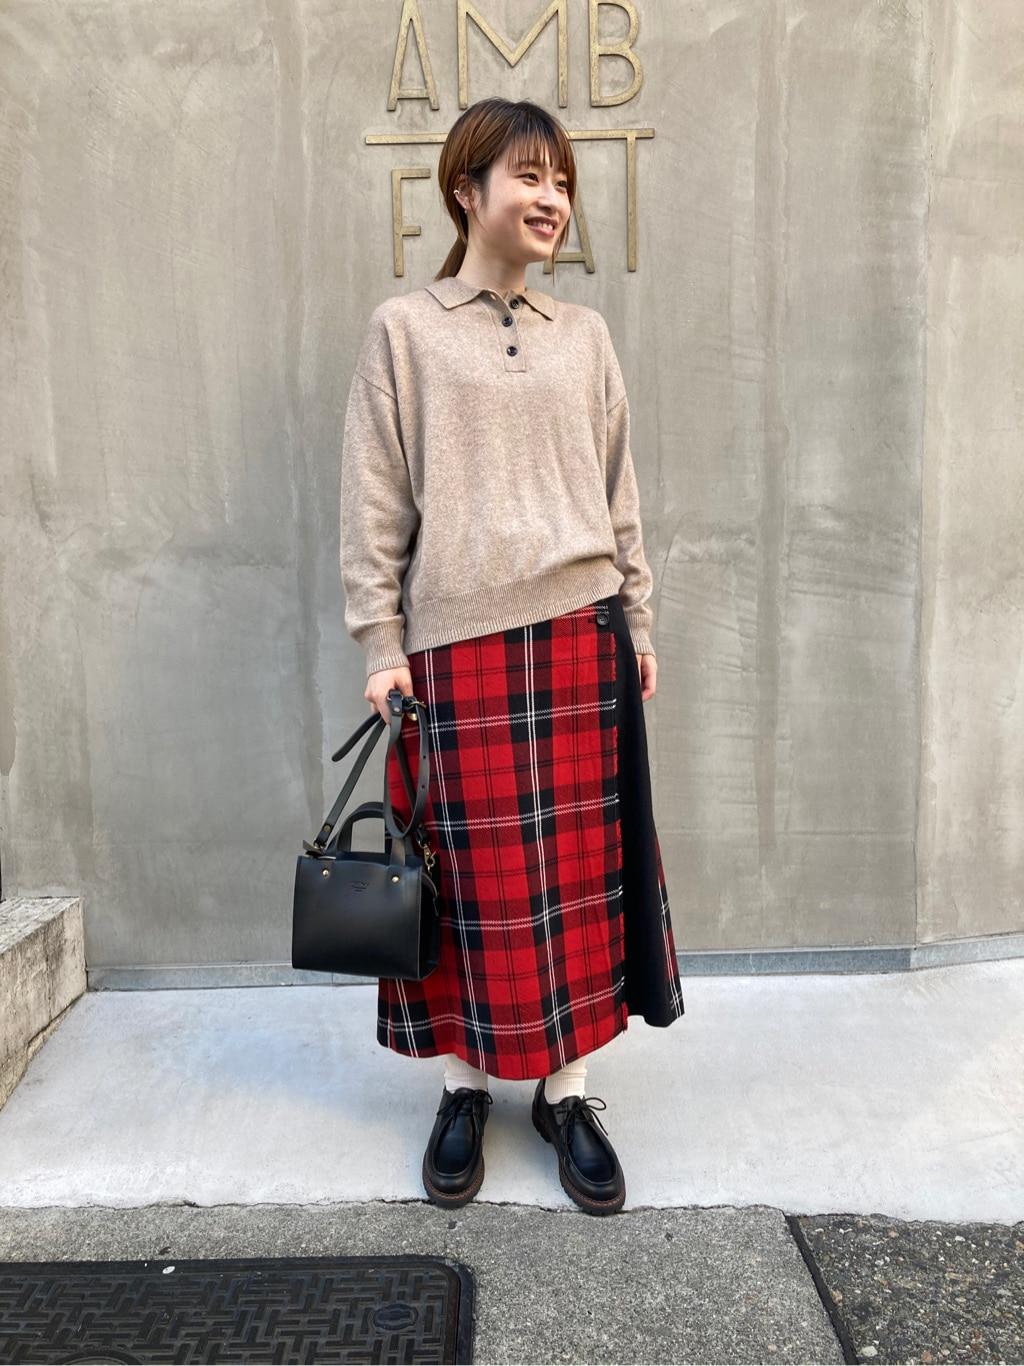 FLAT AMB 名古屋栄路面 2020.10.15